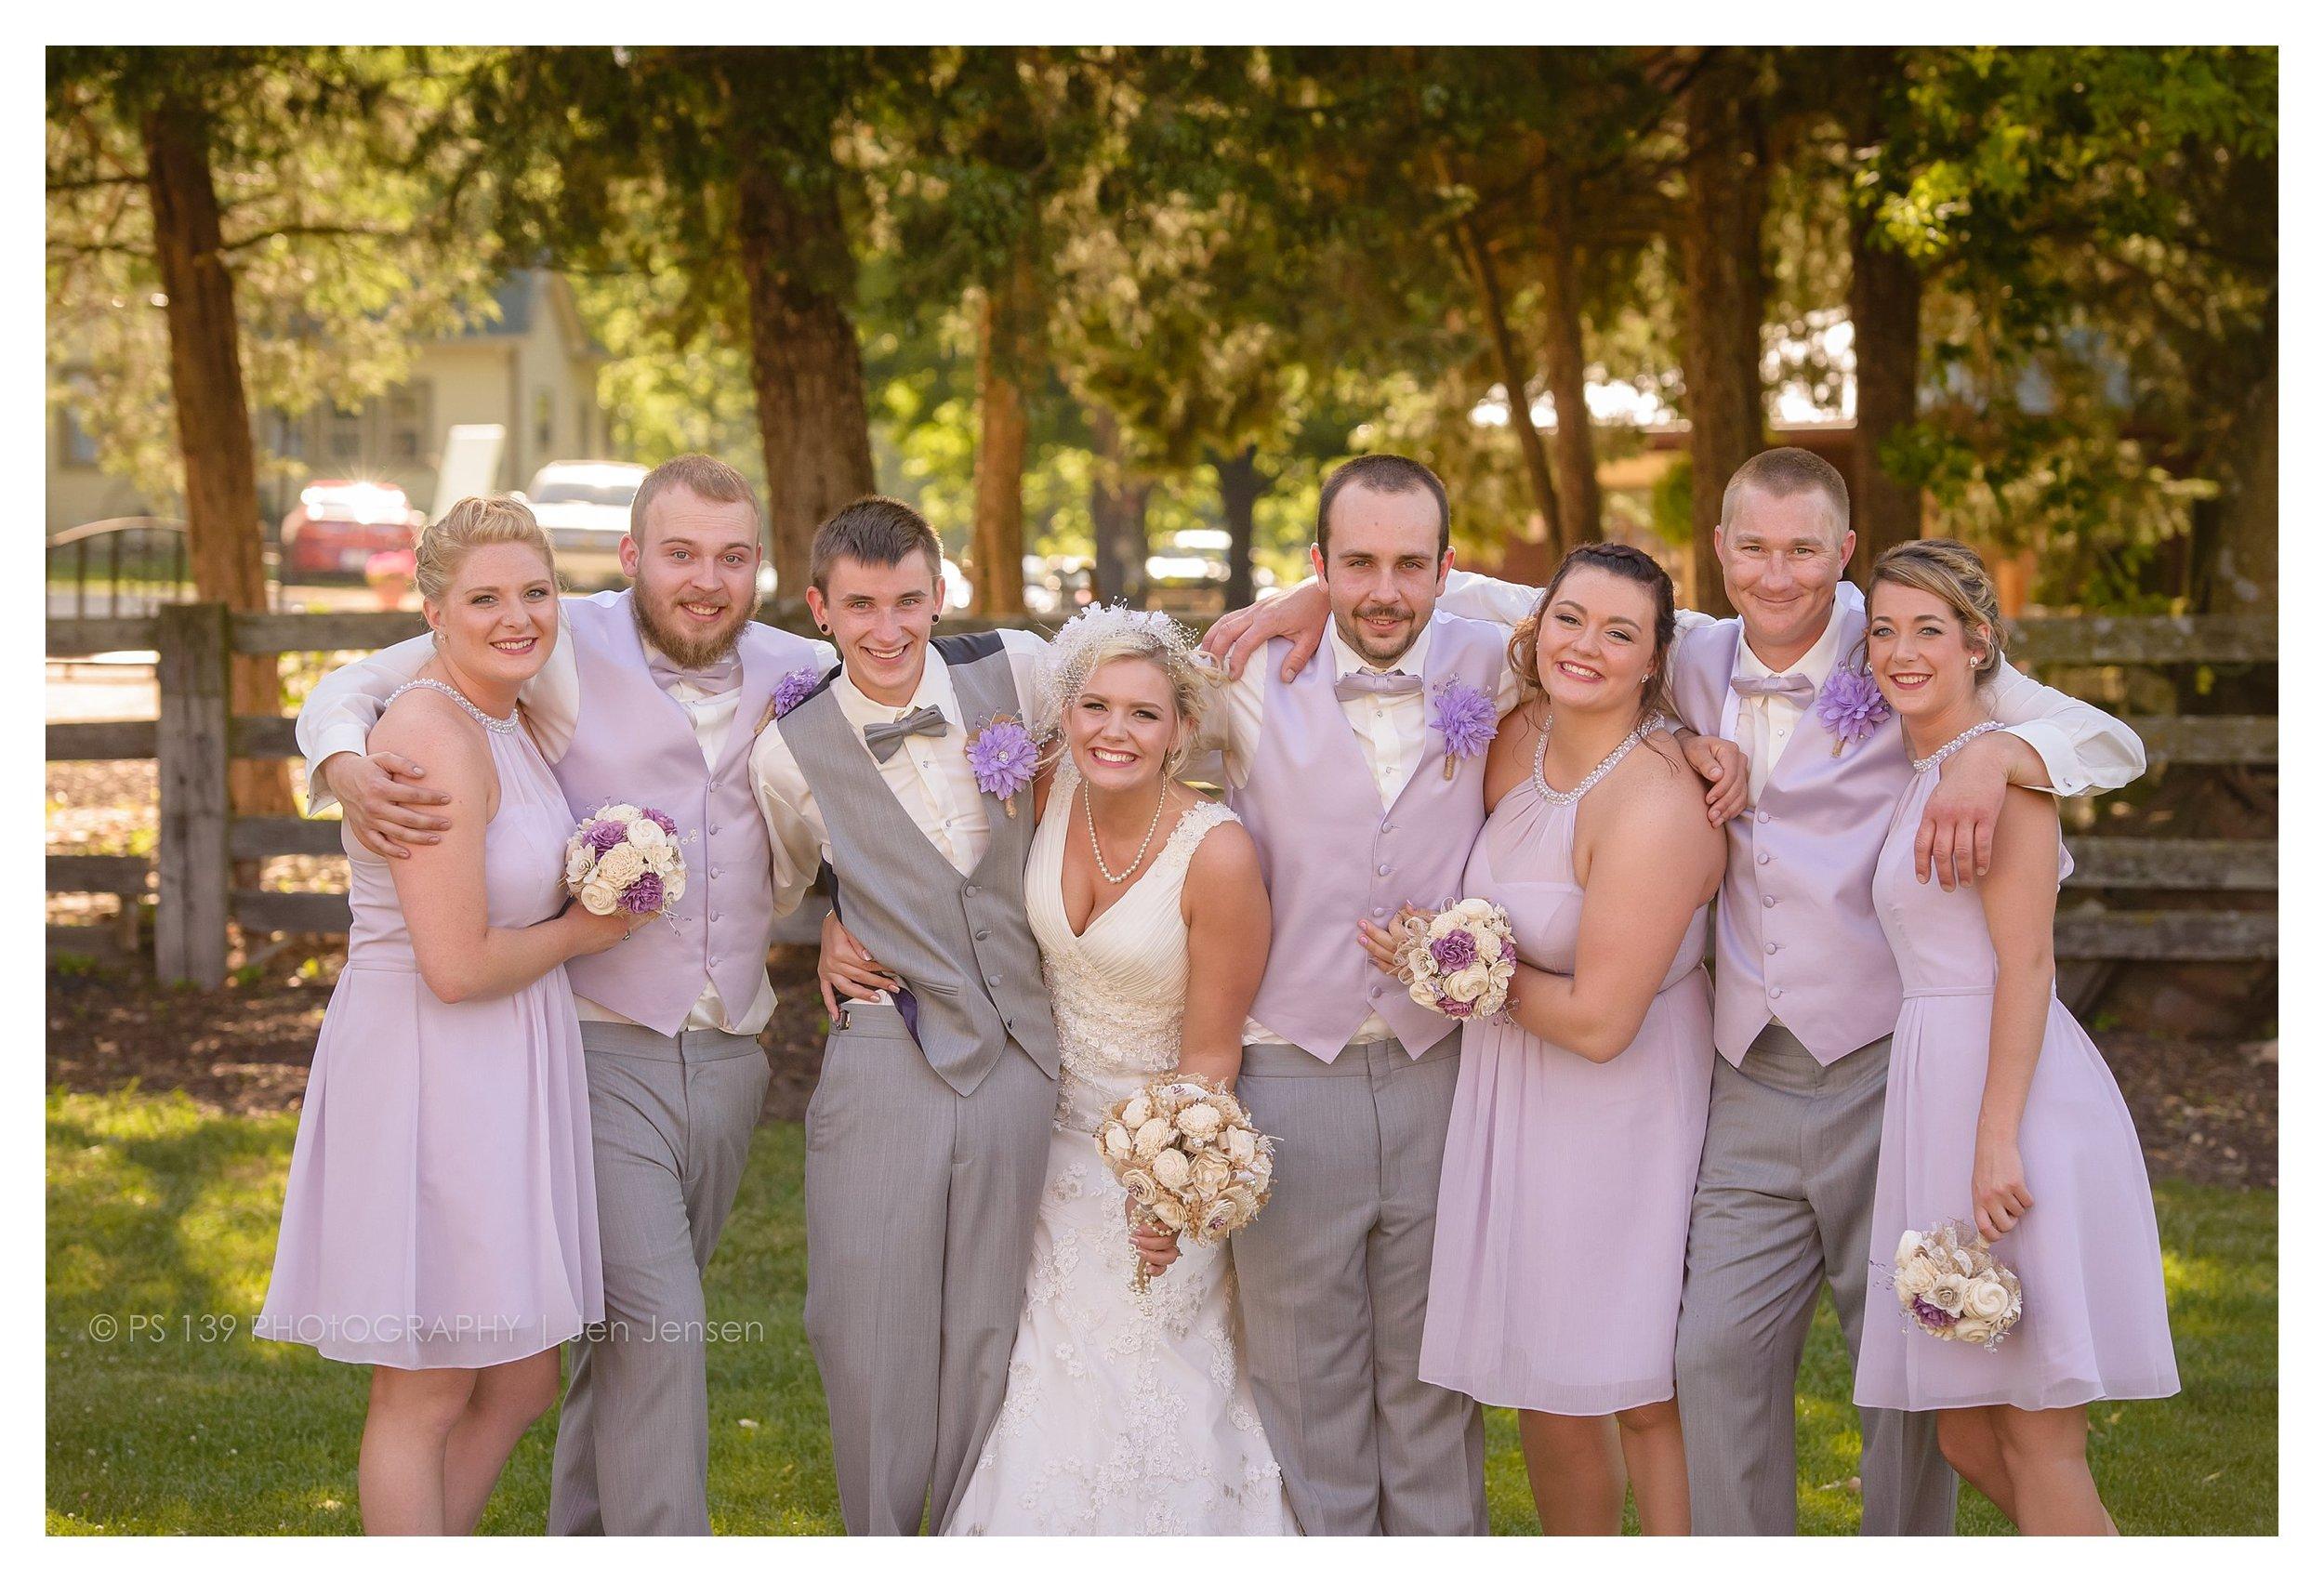 oregon Illinois oak lane farm wisconsin wedding photographer bayfield wi ps 139 photography jen jensen_0238.jpg